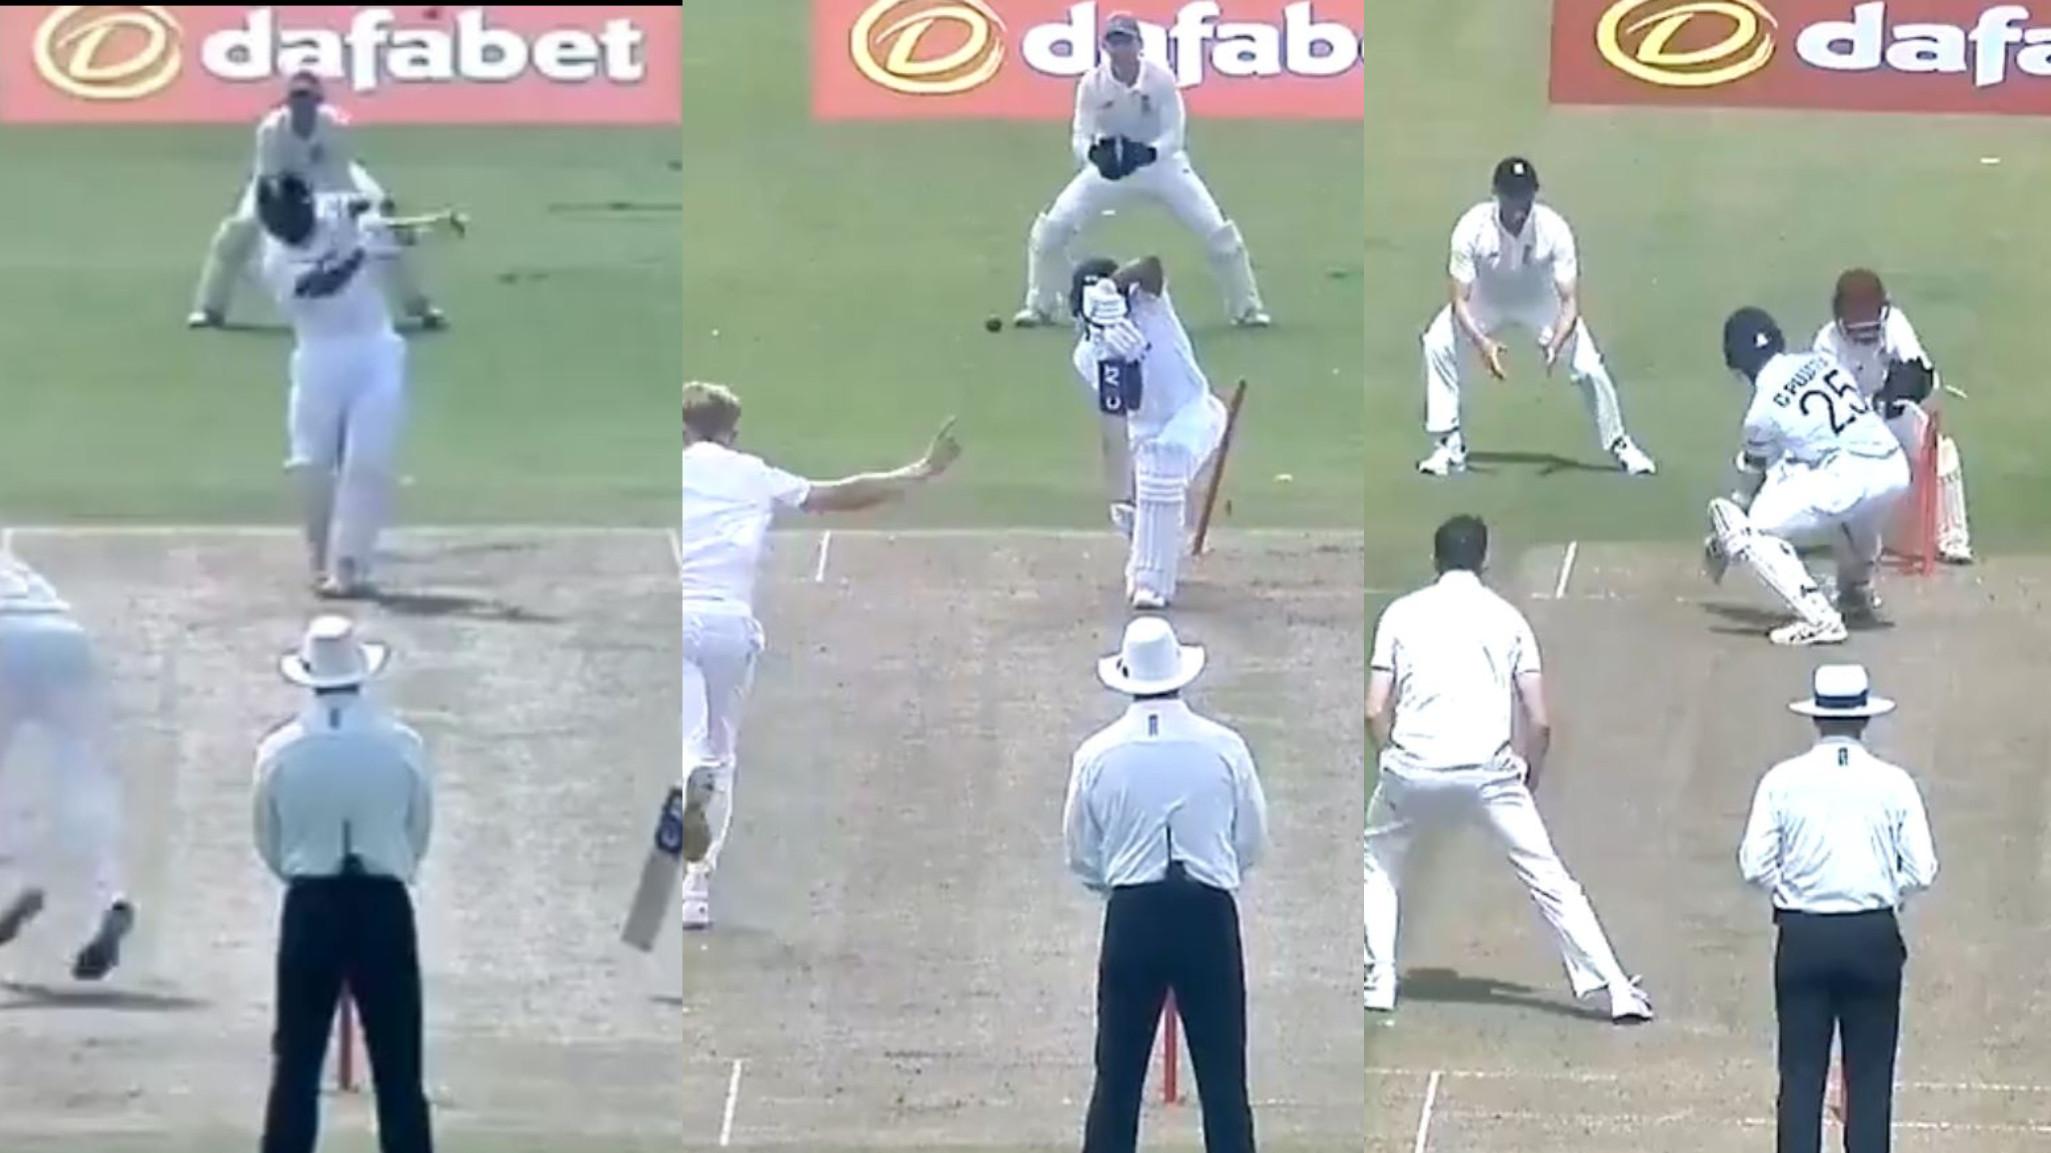 WATCH- India's top three Rohit Sharma, Mayank Agarwal and Cheteshwar Pujara flop in warm-up game